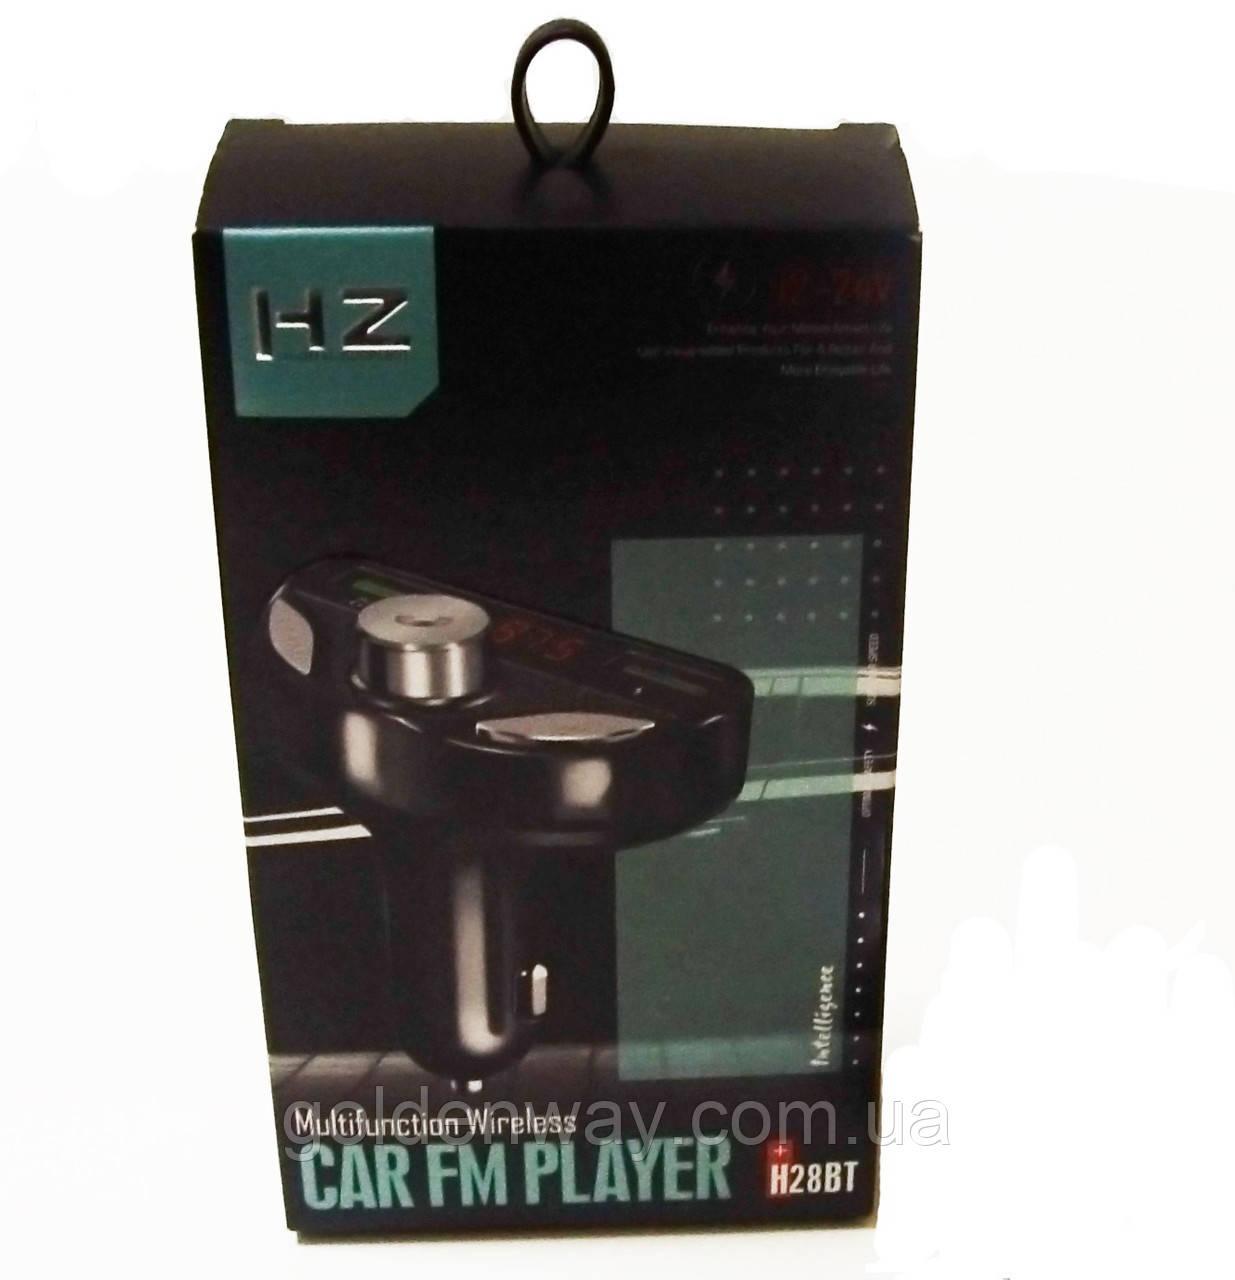 Автомобильный FM трансмиттер модулятор MOD. HZ H28BT  Modulator Bluetooth музыка MP3 с USB